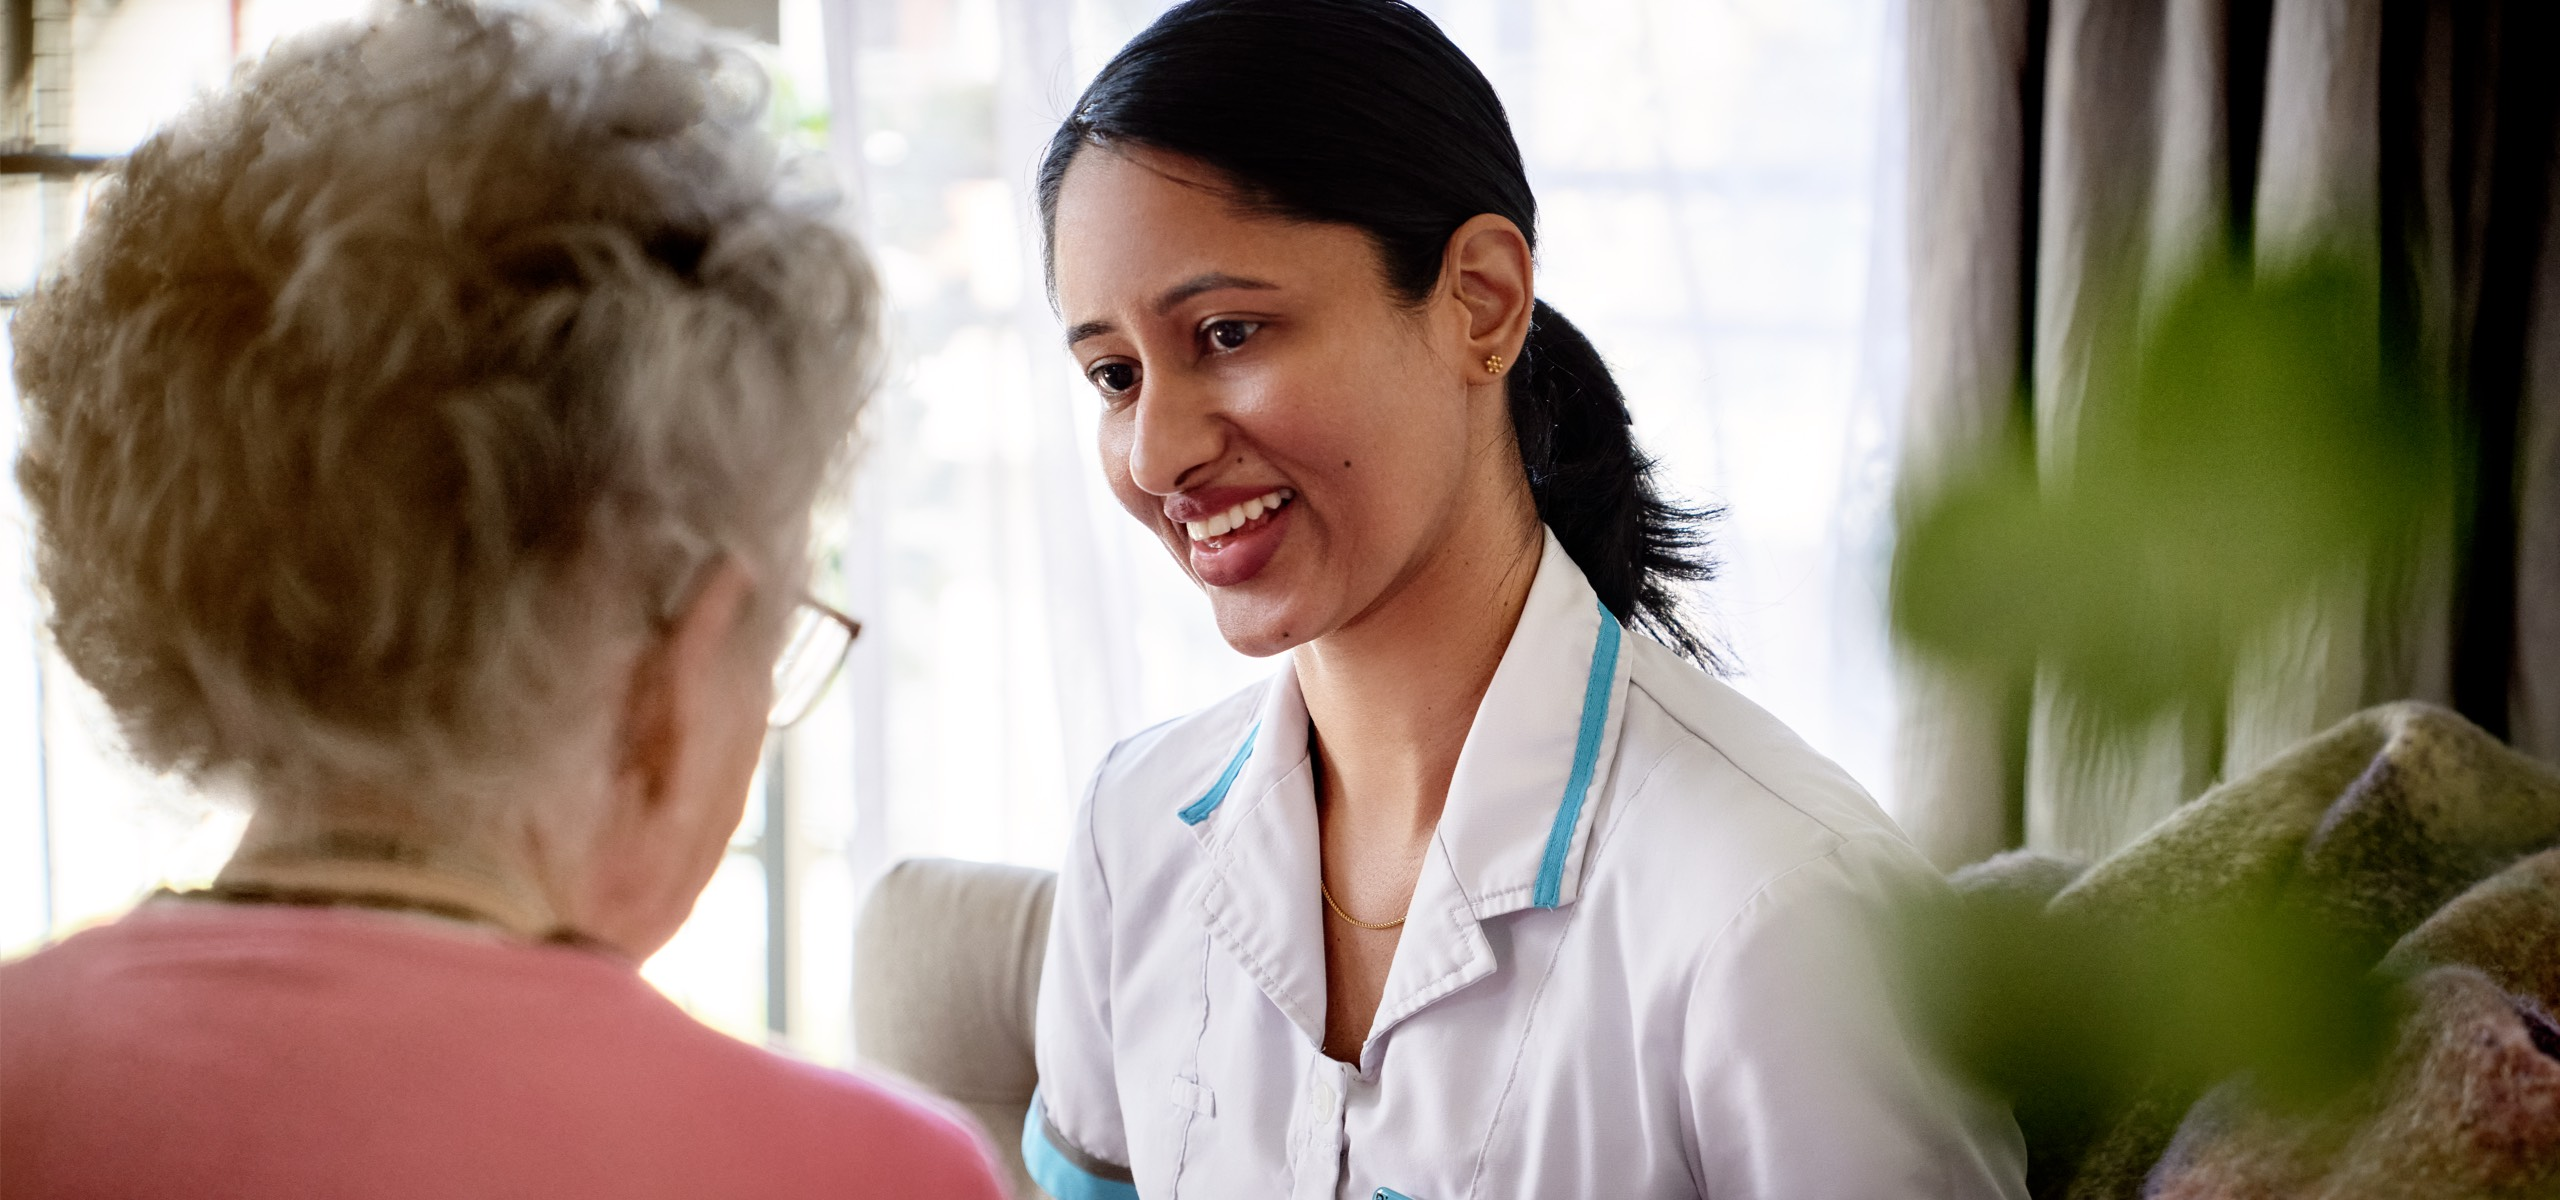 Oceania nurse smiling at resident